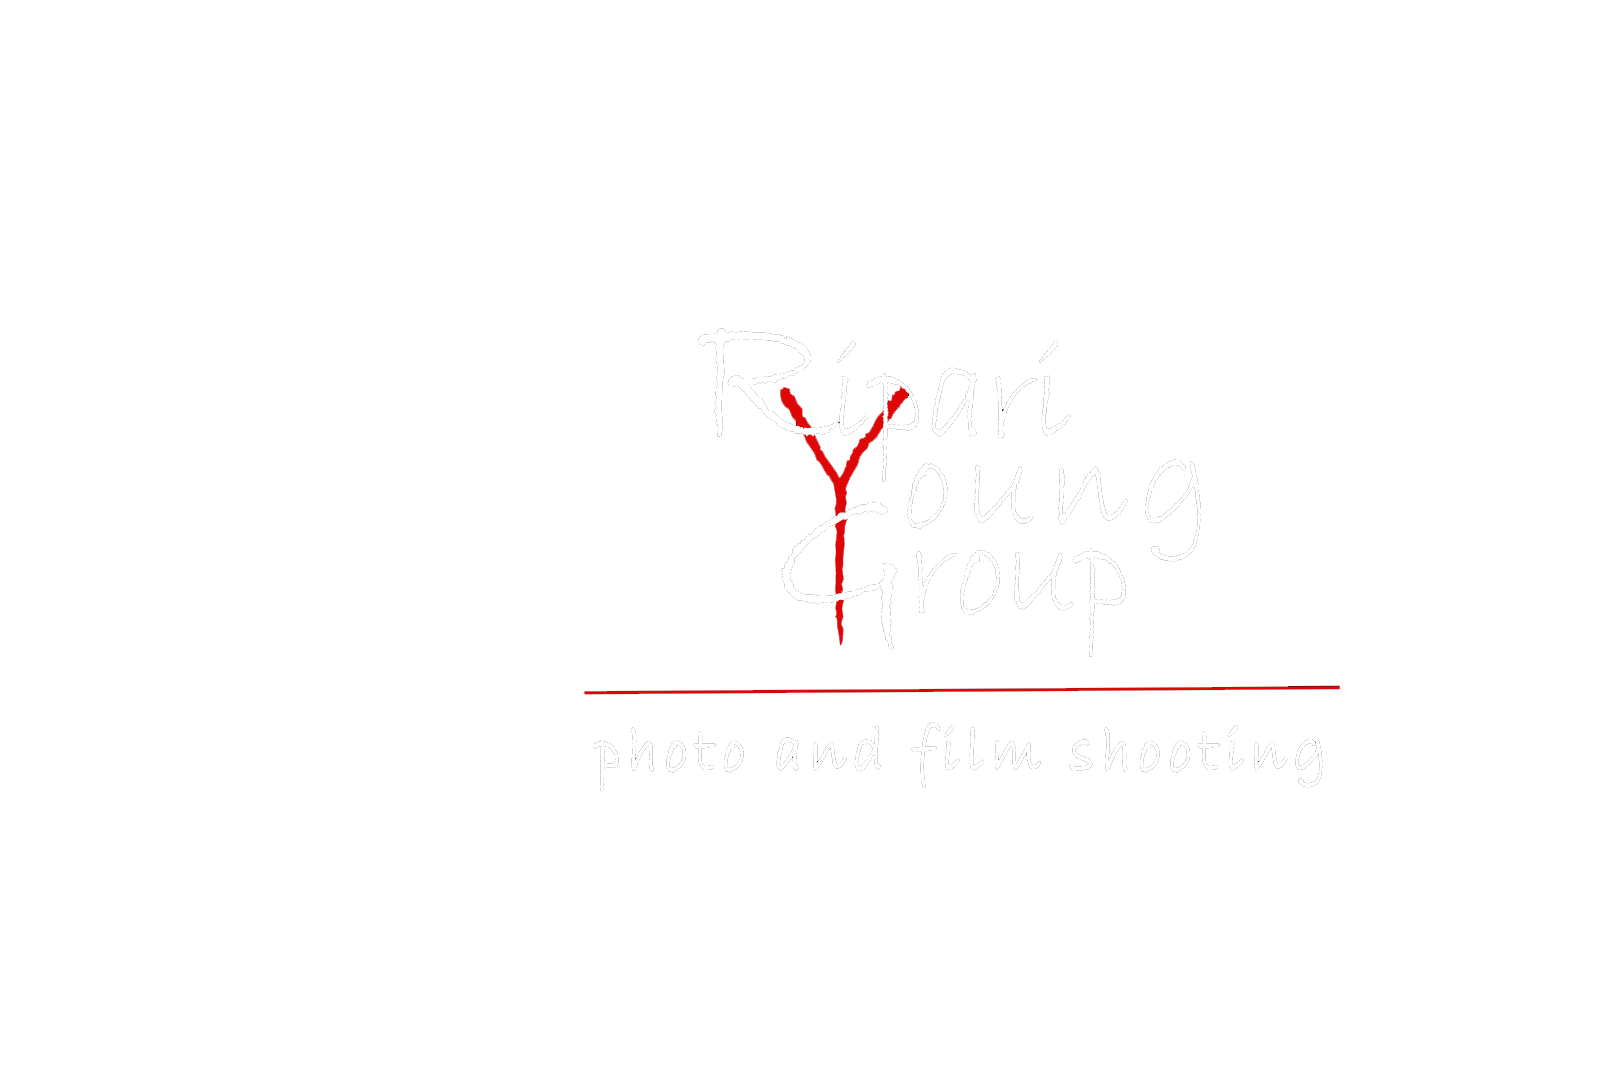 RipariYoungGroup home dx linea sotto1600x1091